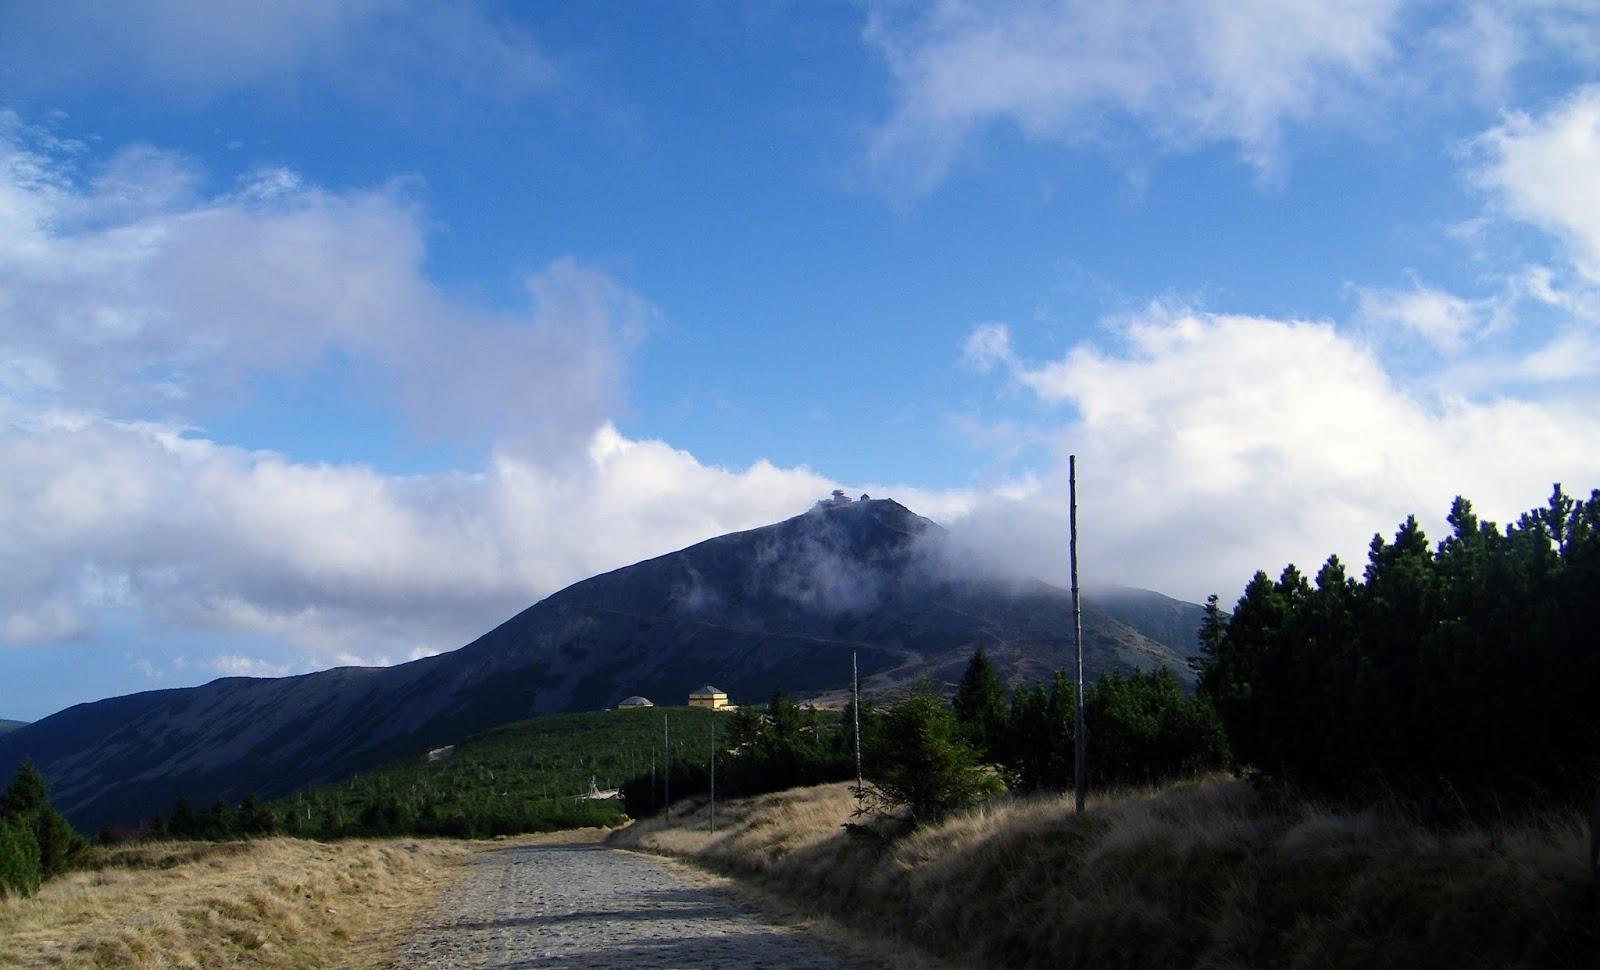 Blog górski, szlak na Śnieżkę, Kiedy jechać w góry?